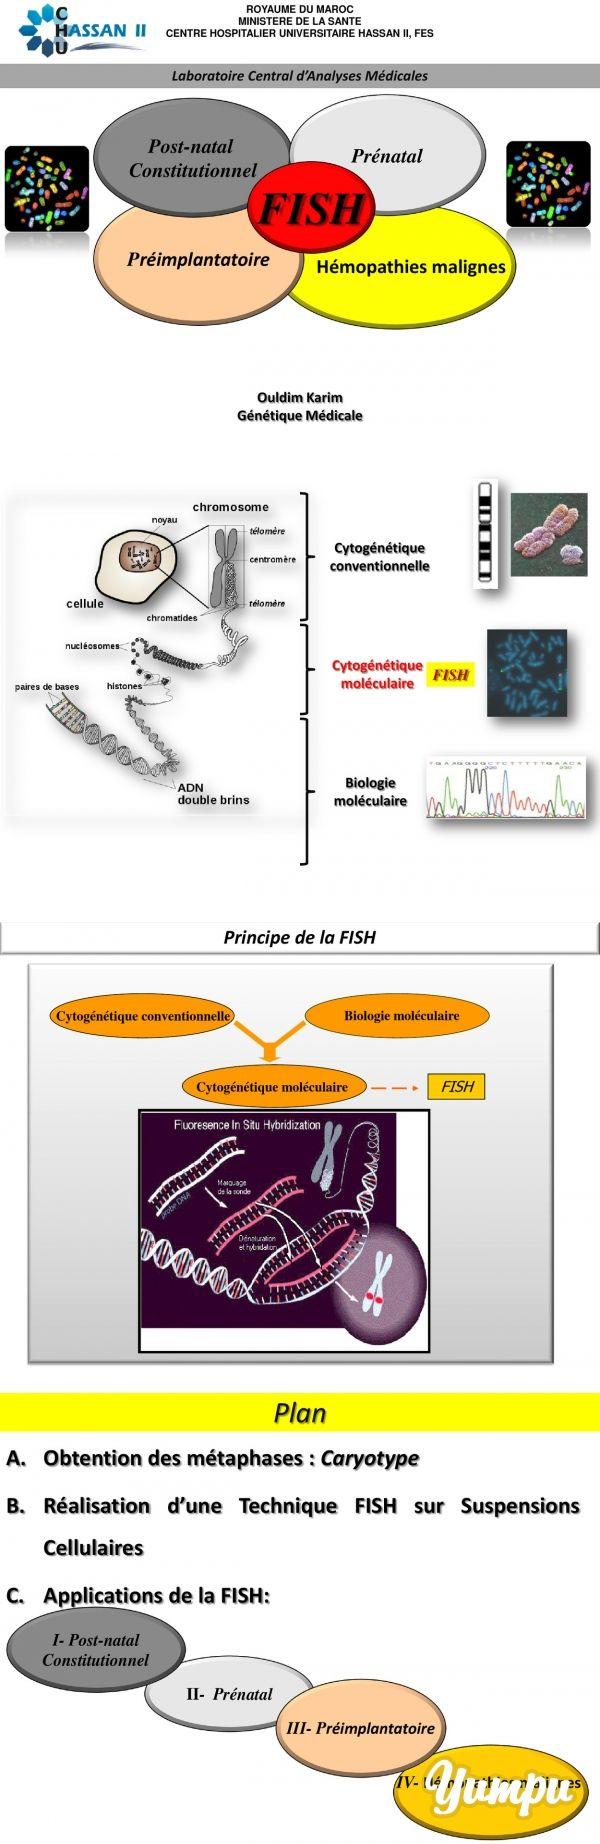 Plan cellule dynamis sur defender - Cytog N Tique Mol Culaire L Hybridation In Situ Fluorescente Cytog N Tique Mol Culaire L Hybridation In Situ